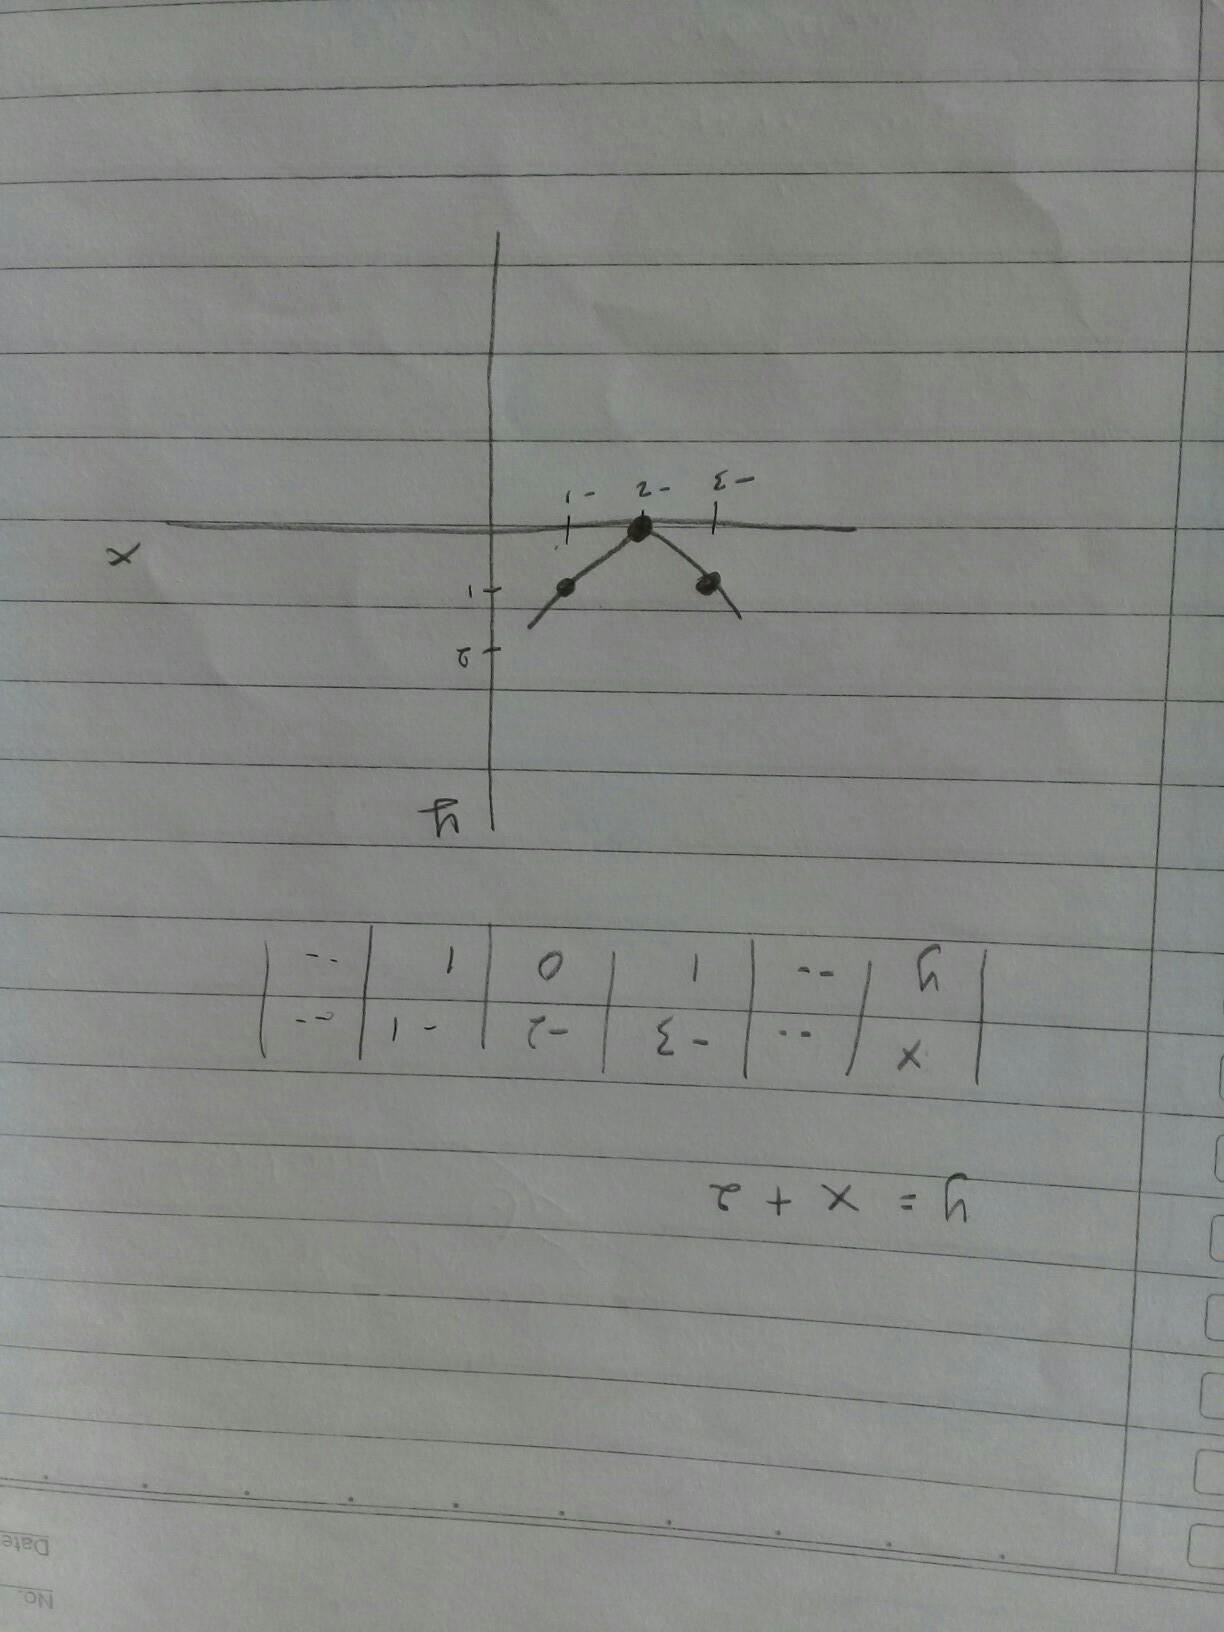 Gambarkan Grafik Bentuk Nilai Mutlak Berikut Dengan Memanfaatkan Definisi 1.1 : gambarkan, grafik, bentuk, nilai, mutlak, berikut, dengan, memanfaatkan, definisi, Gambarkan, Grafik, Bentuk, Nilai, Mutlak, Berikut, Dengan, Memanfaatkan, Definisi, Brainly.co.id